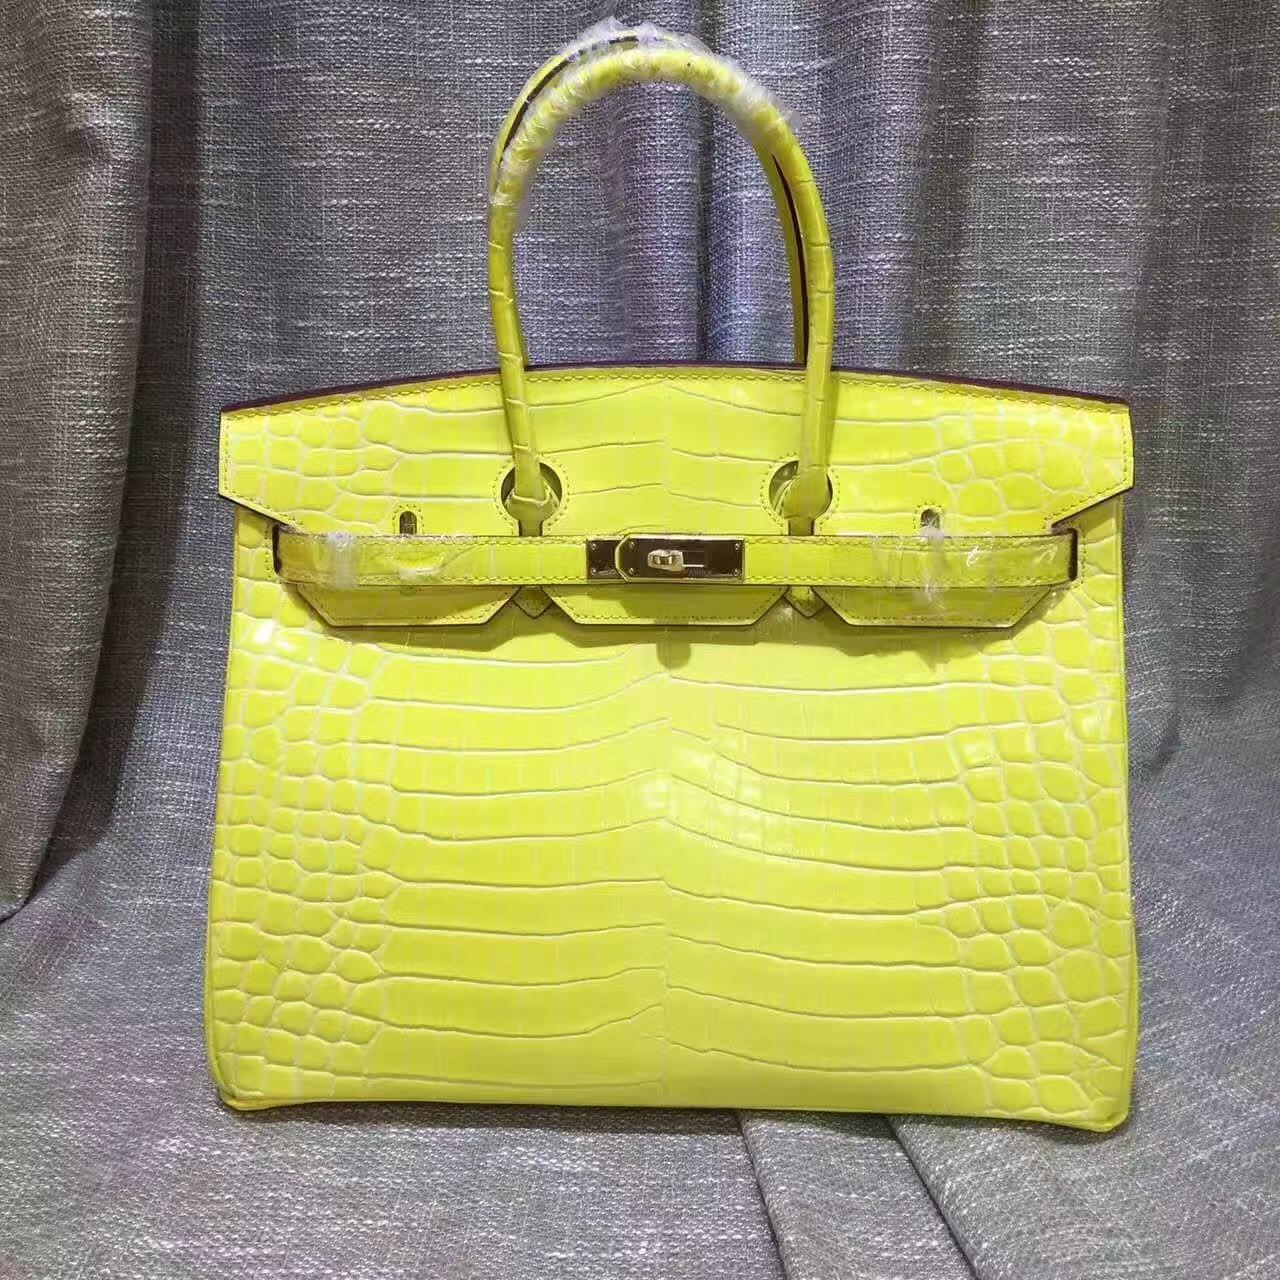 d58f39128b Hermes Birkin 35cm Togo leather Handbags Cherry Pink Golden  RH0350 ...